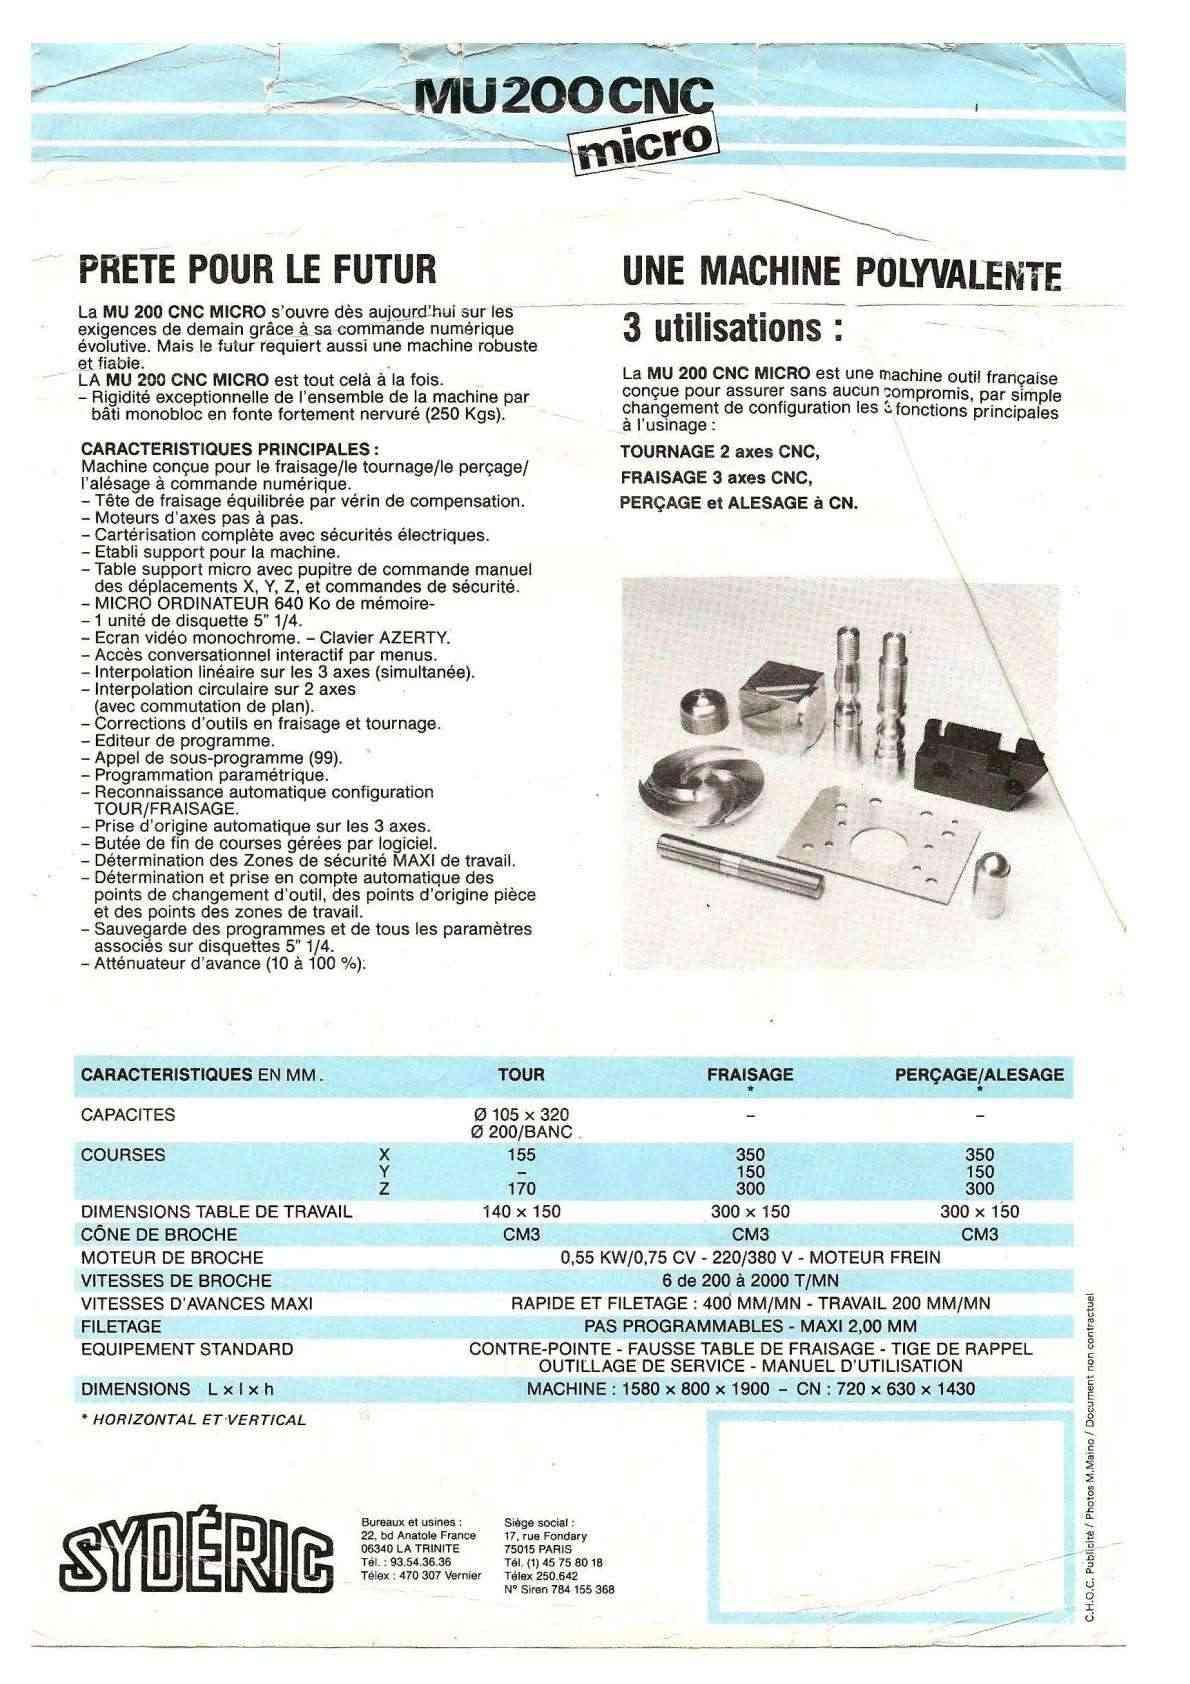 Sydéric MU200 CNC Uw1240